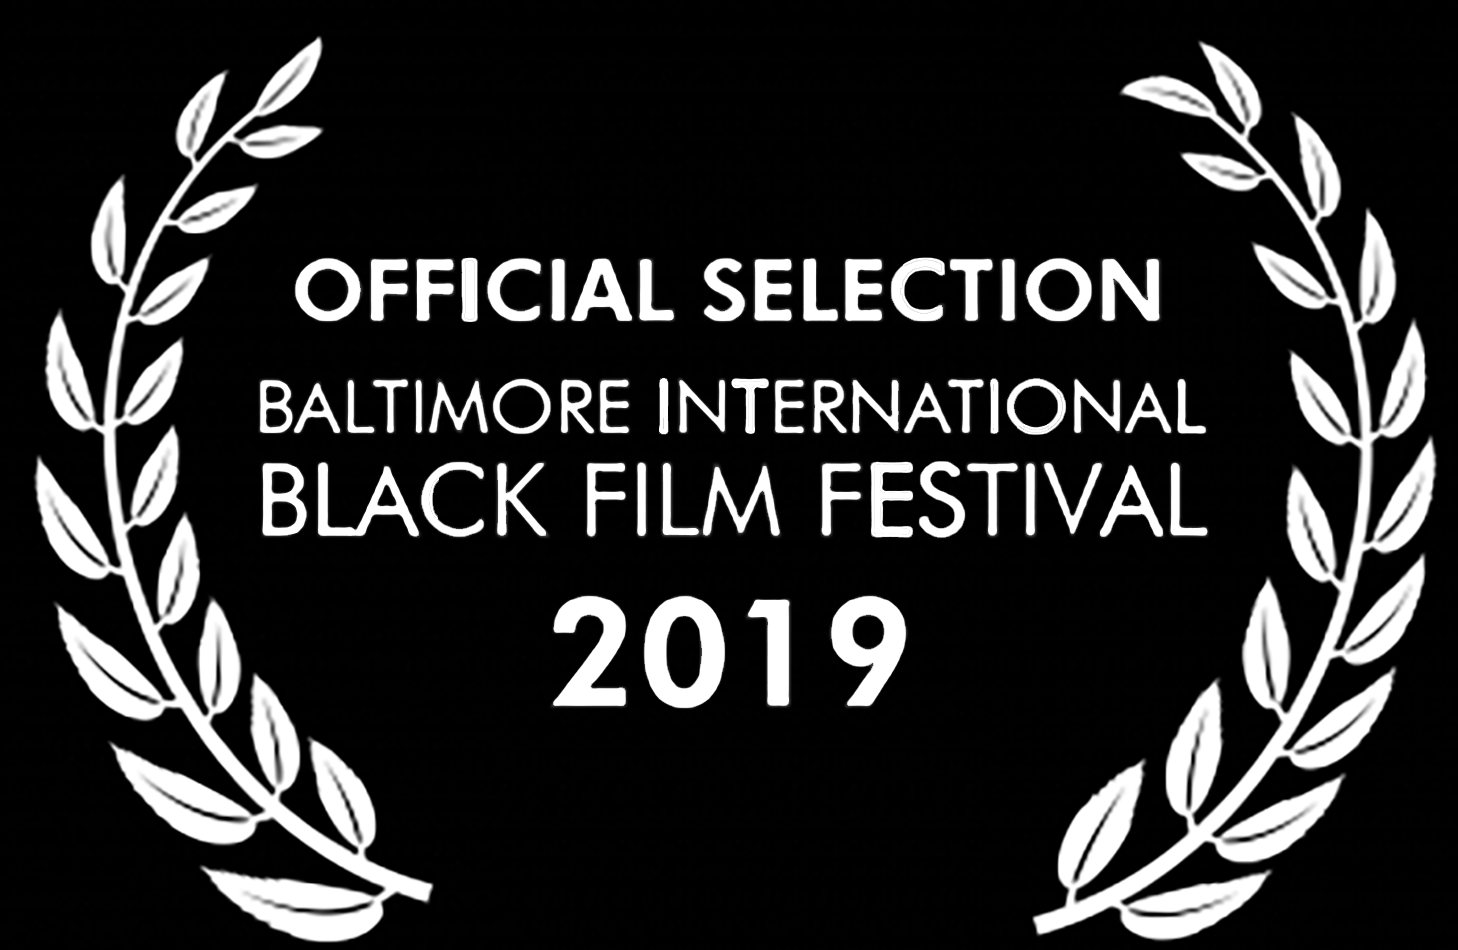 BIBFF_2019_Official Selection Laurel Black.png